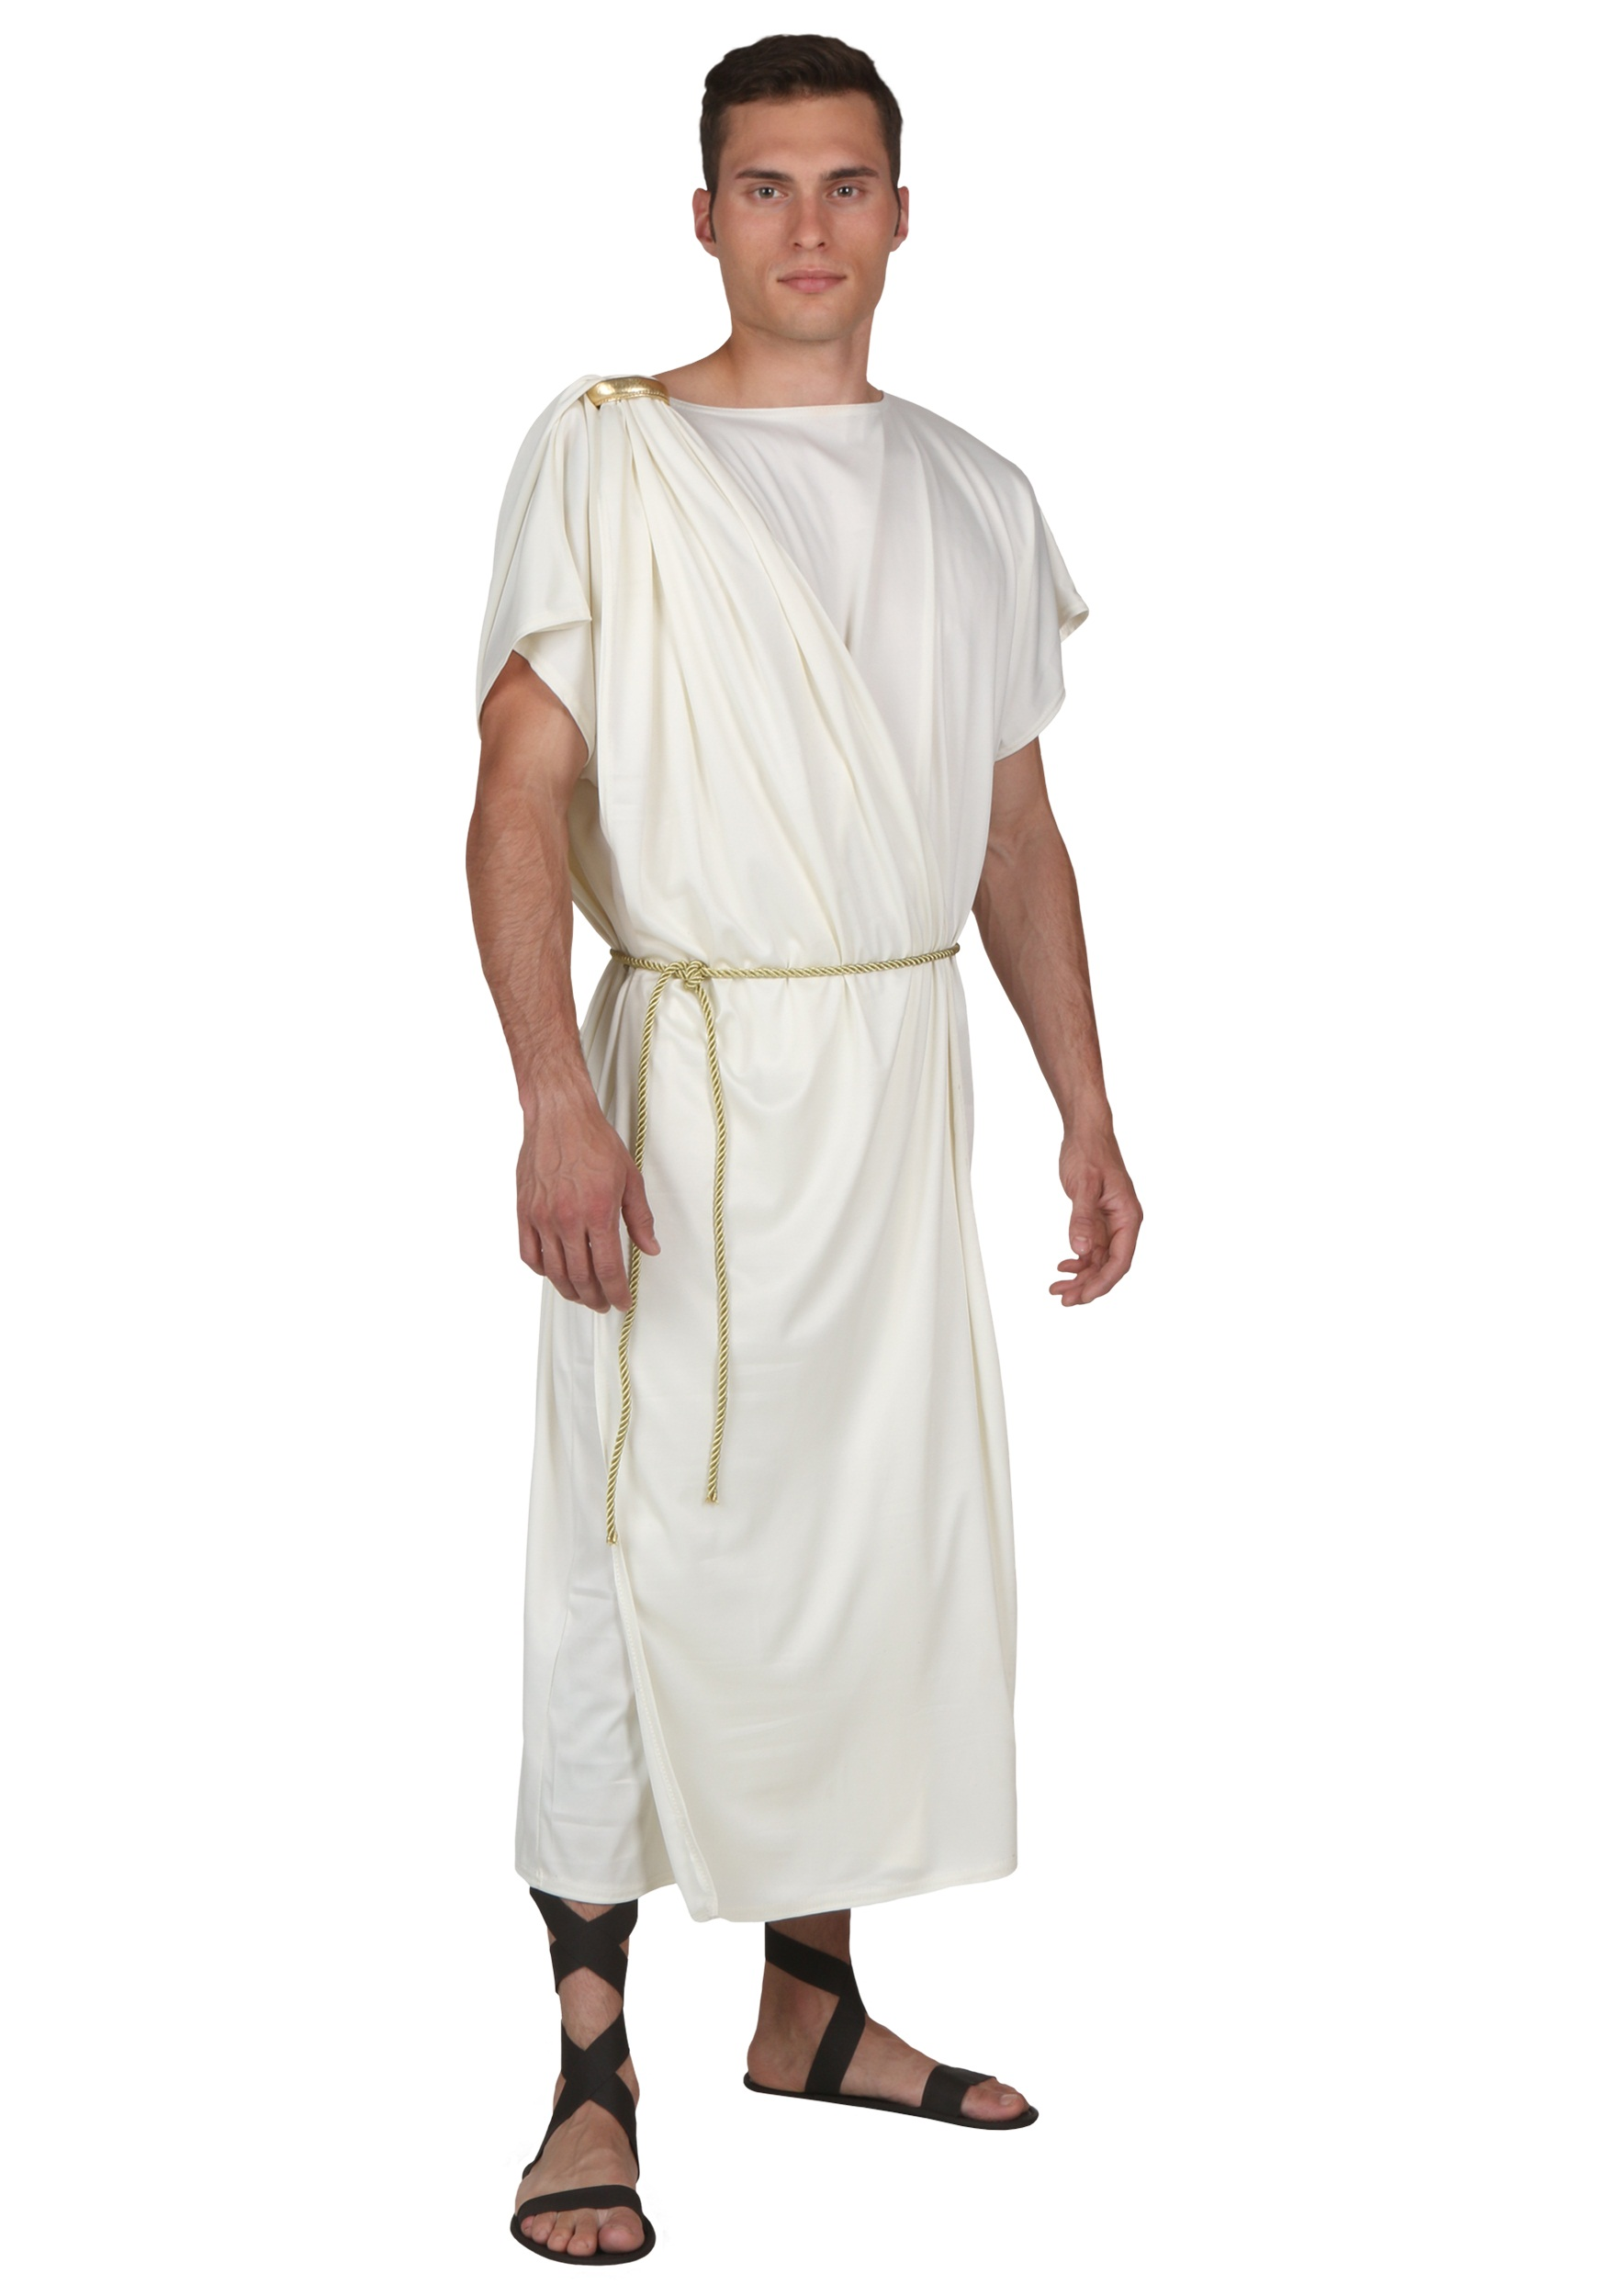 Plus Size Toga Halloween Costume for Men   Greek Costume